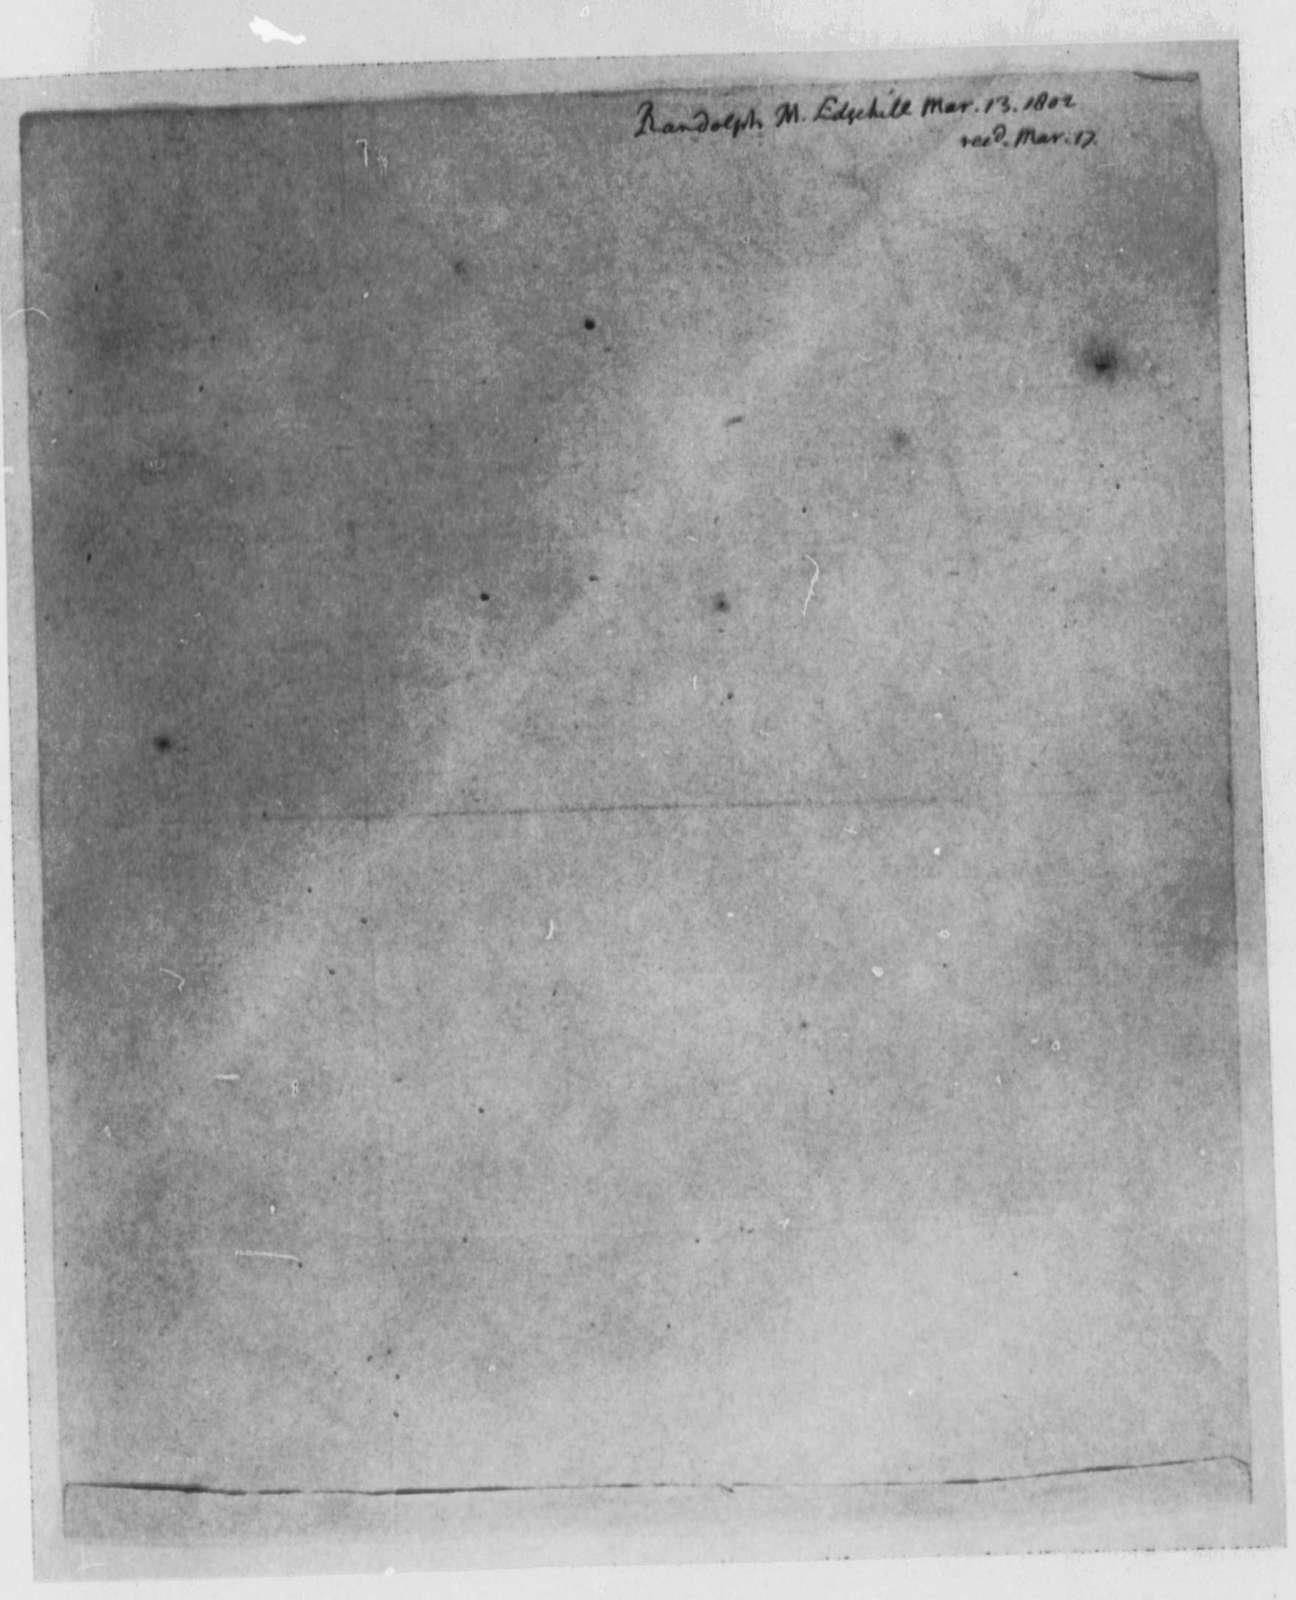 Thomas Mann Randolph, Jr. to Thomas Jefferson, March 13, 1802